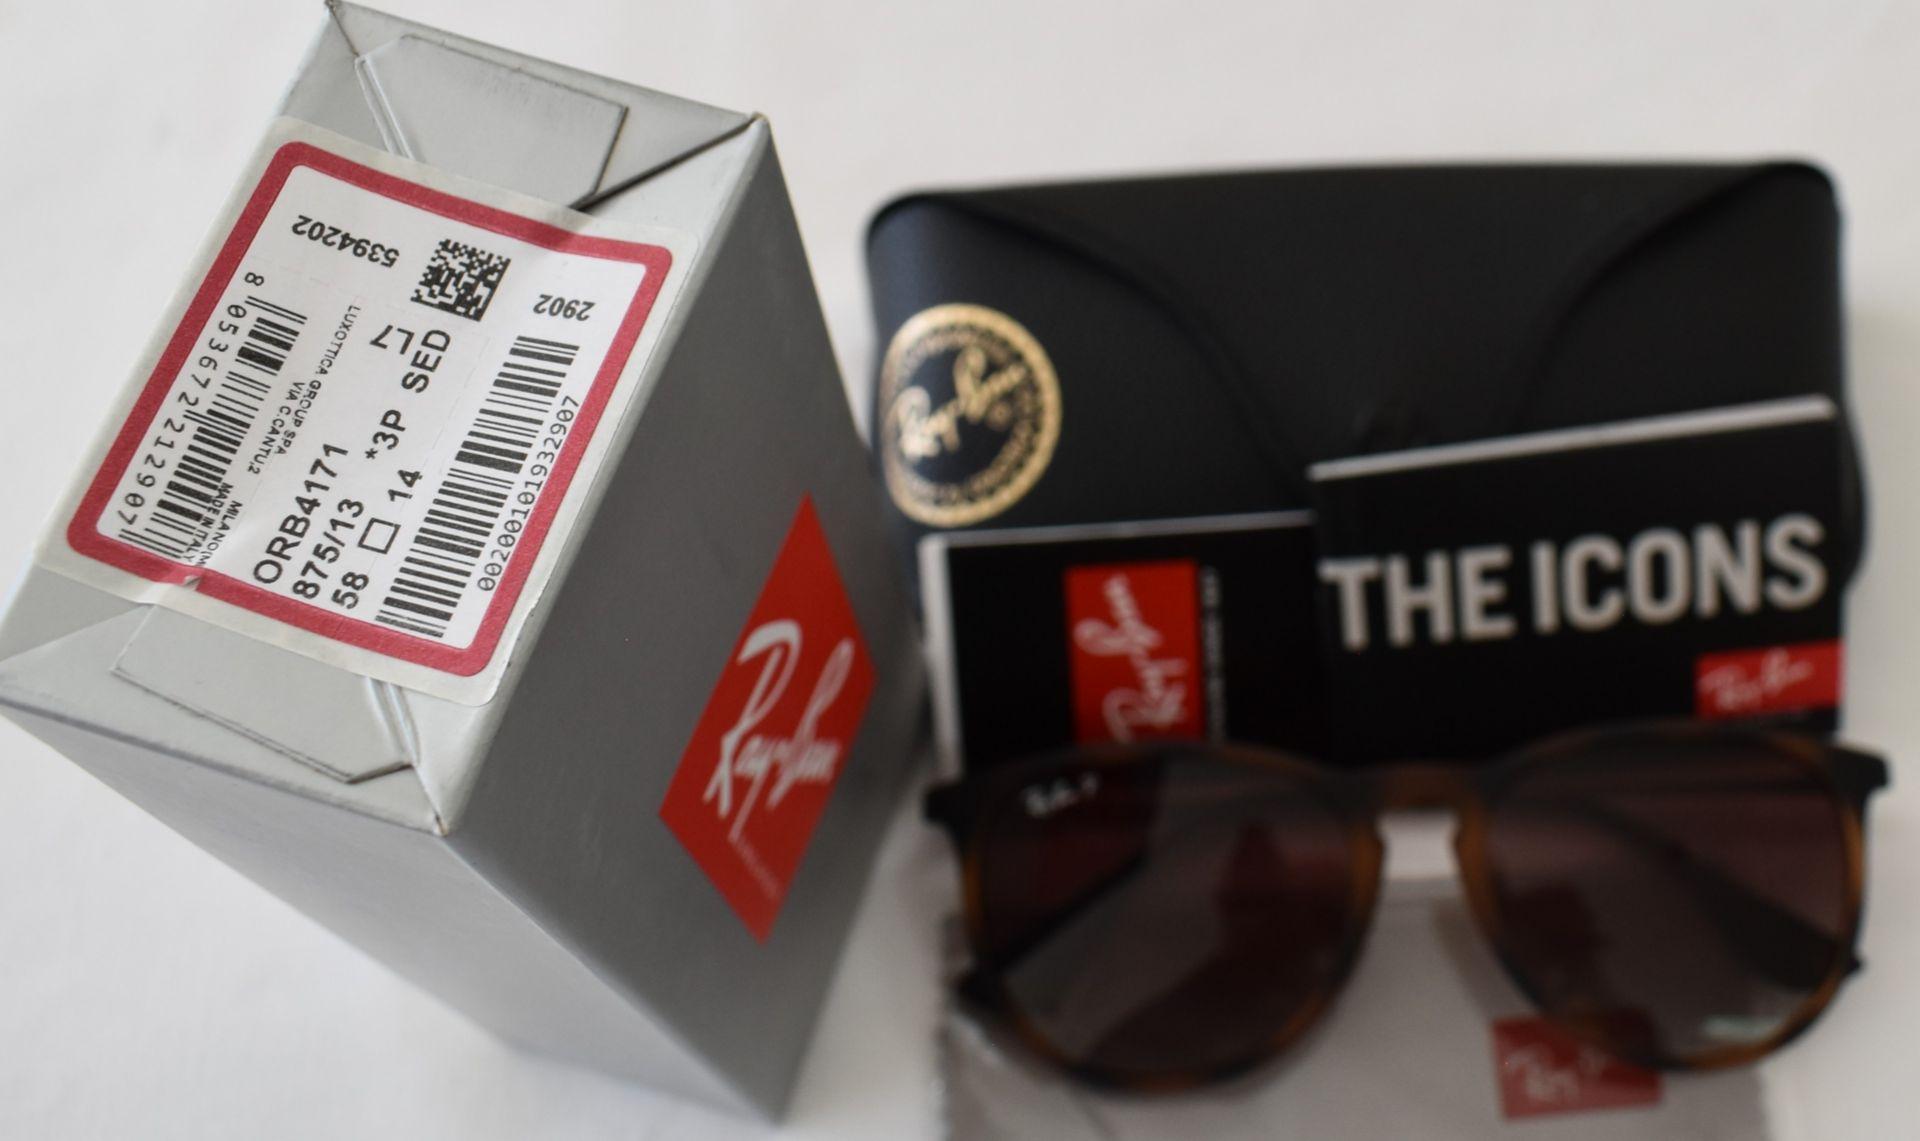 Ray Ban Sunglasses ORB4171 875/13 *3P - Image 3 of 3